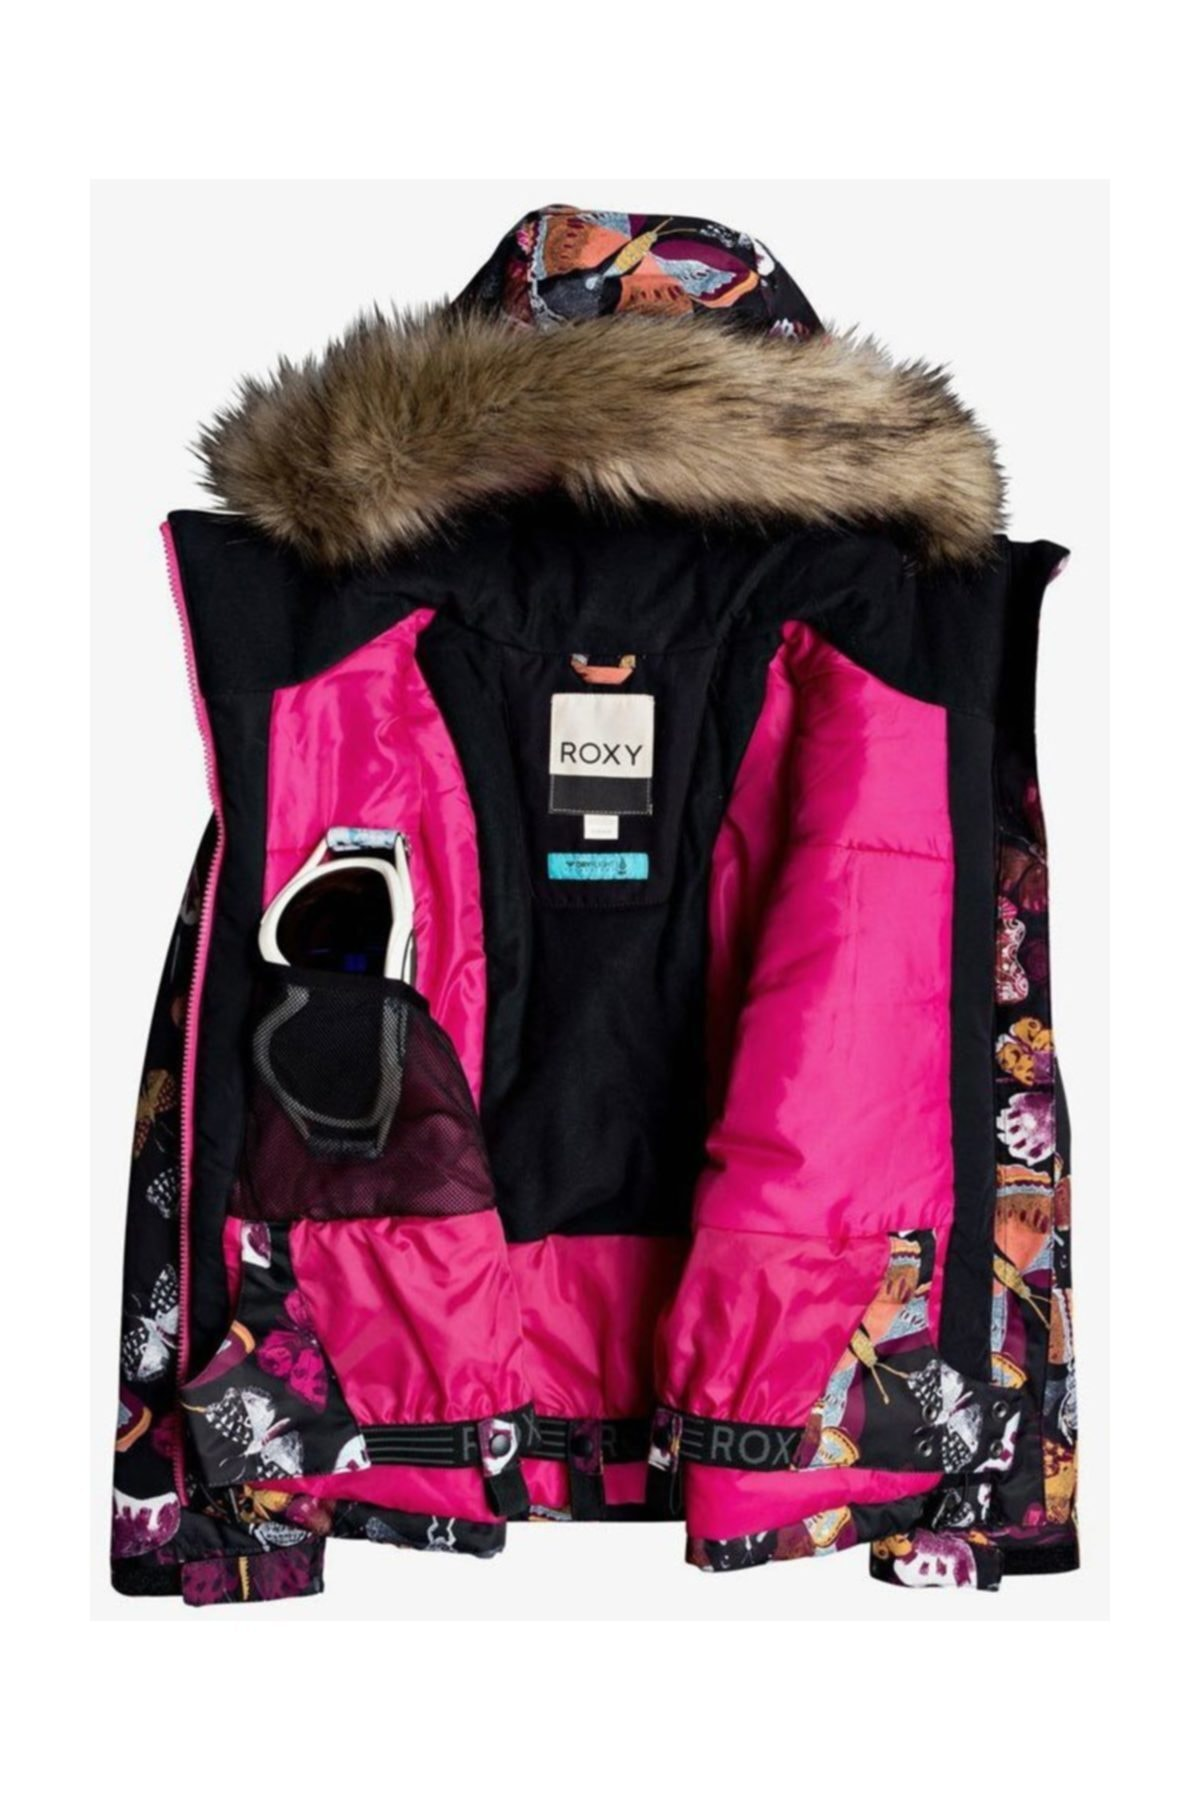 Roxy Jet Ski Kız Çocuk Kayak Montu ERGTJ03075KVM3 2